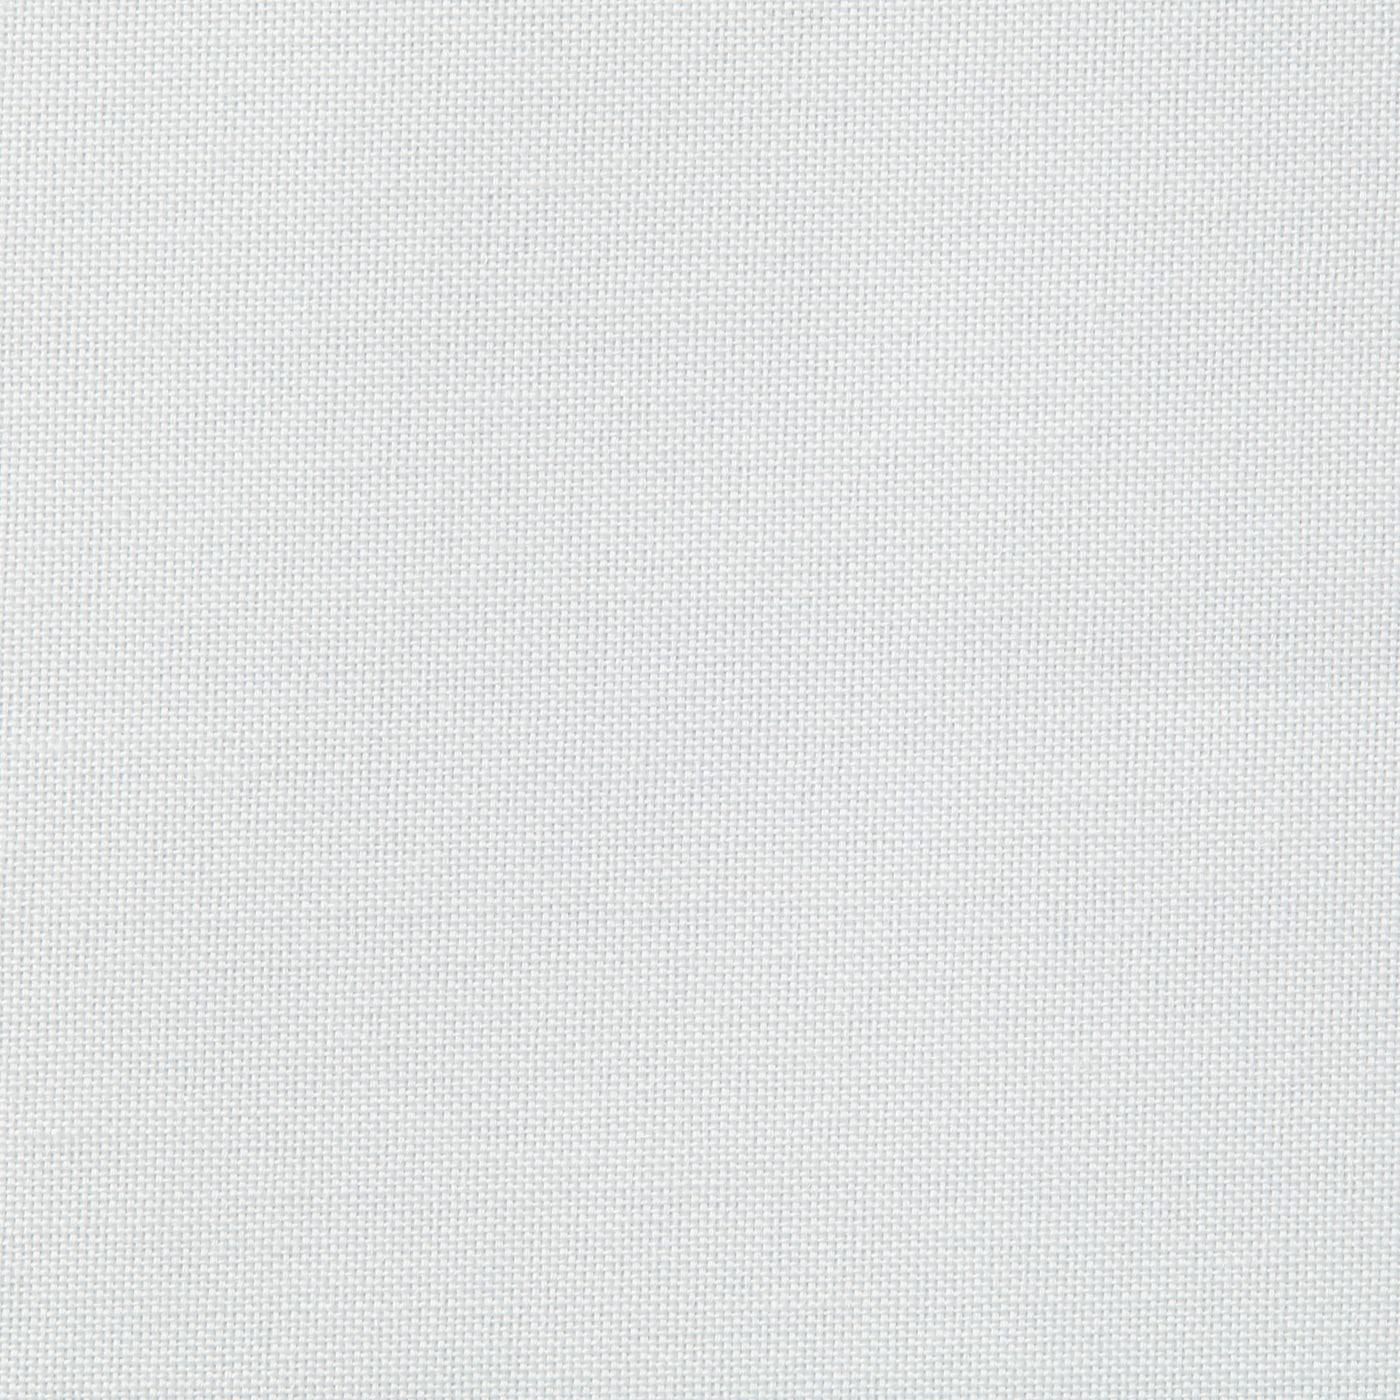 FRIDANS Verdunklungsrollo weiß 120 cm 125 cm 195 cm 2.34 m²